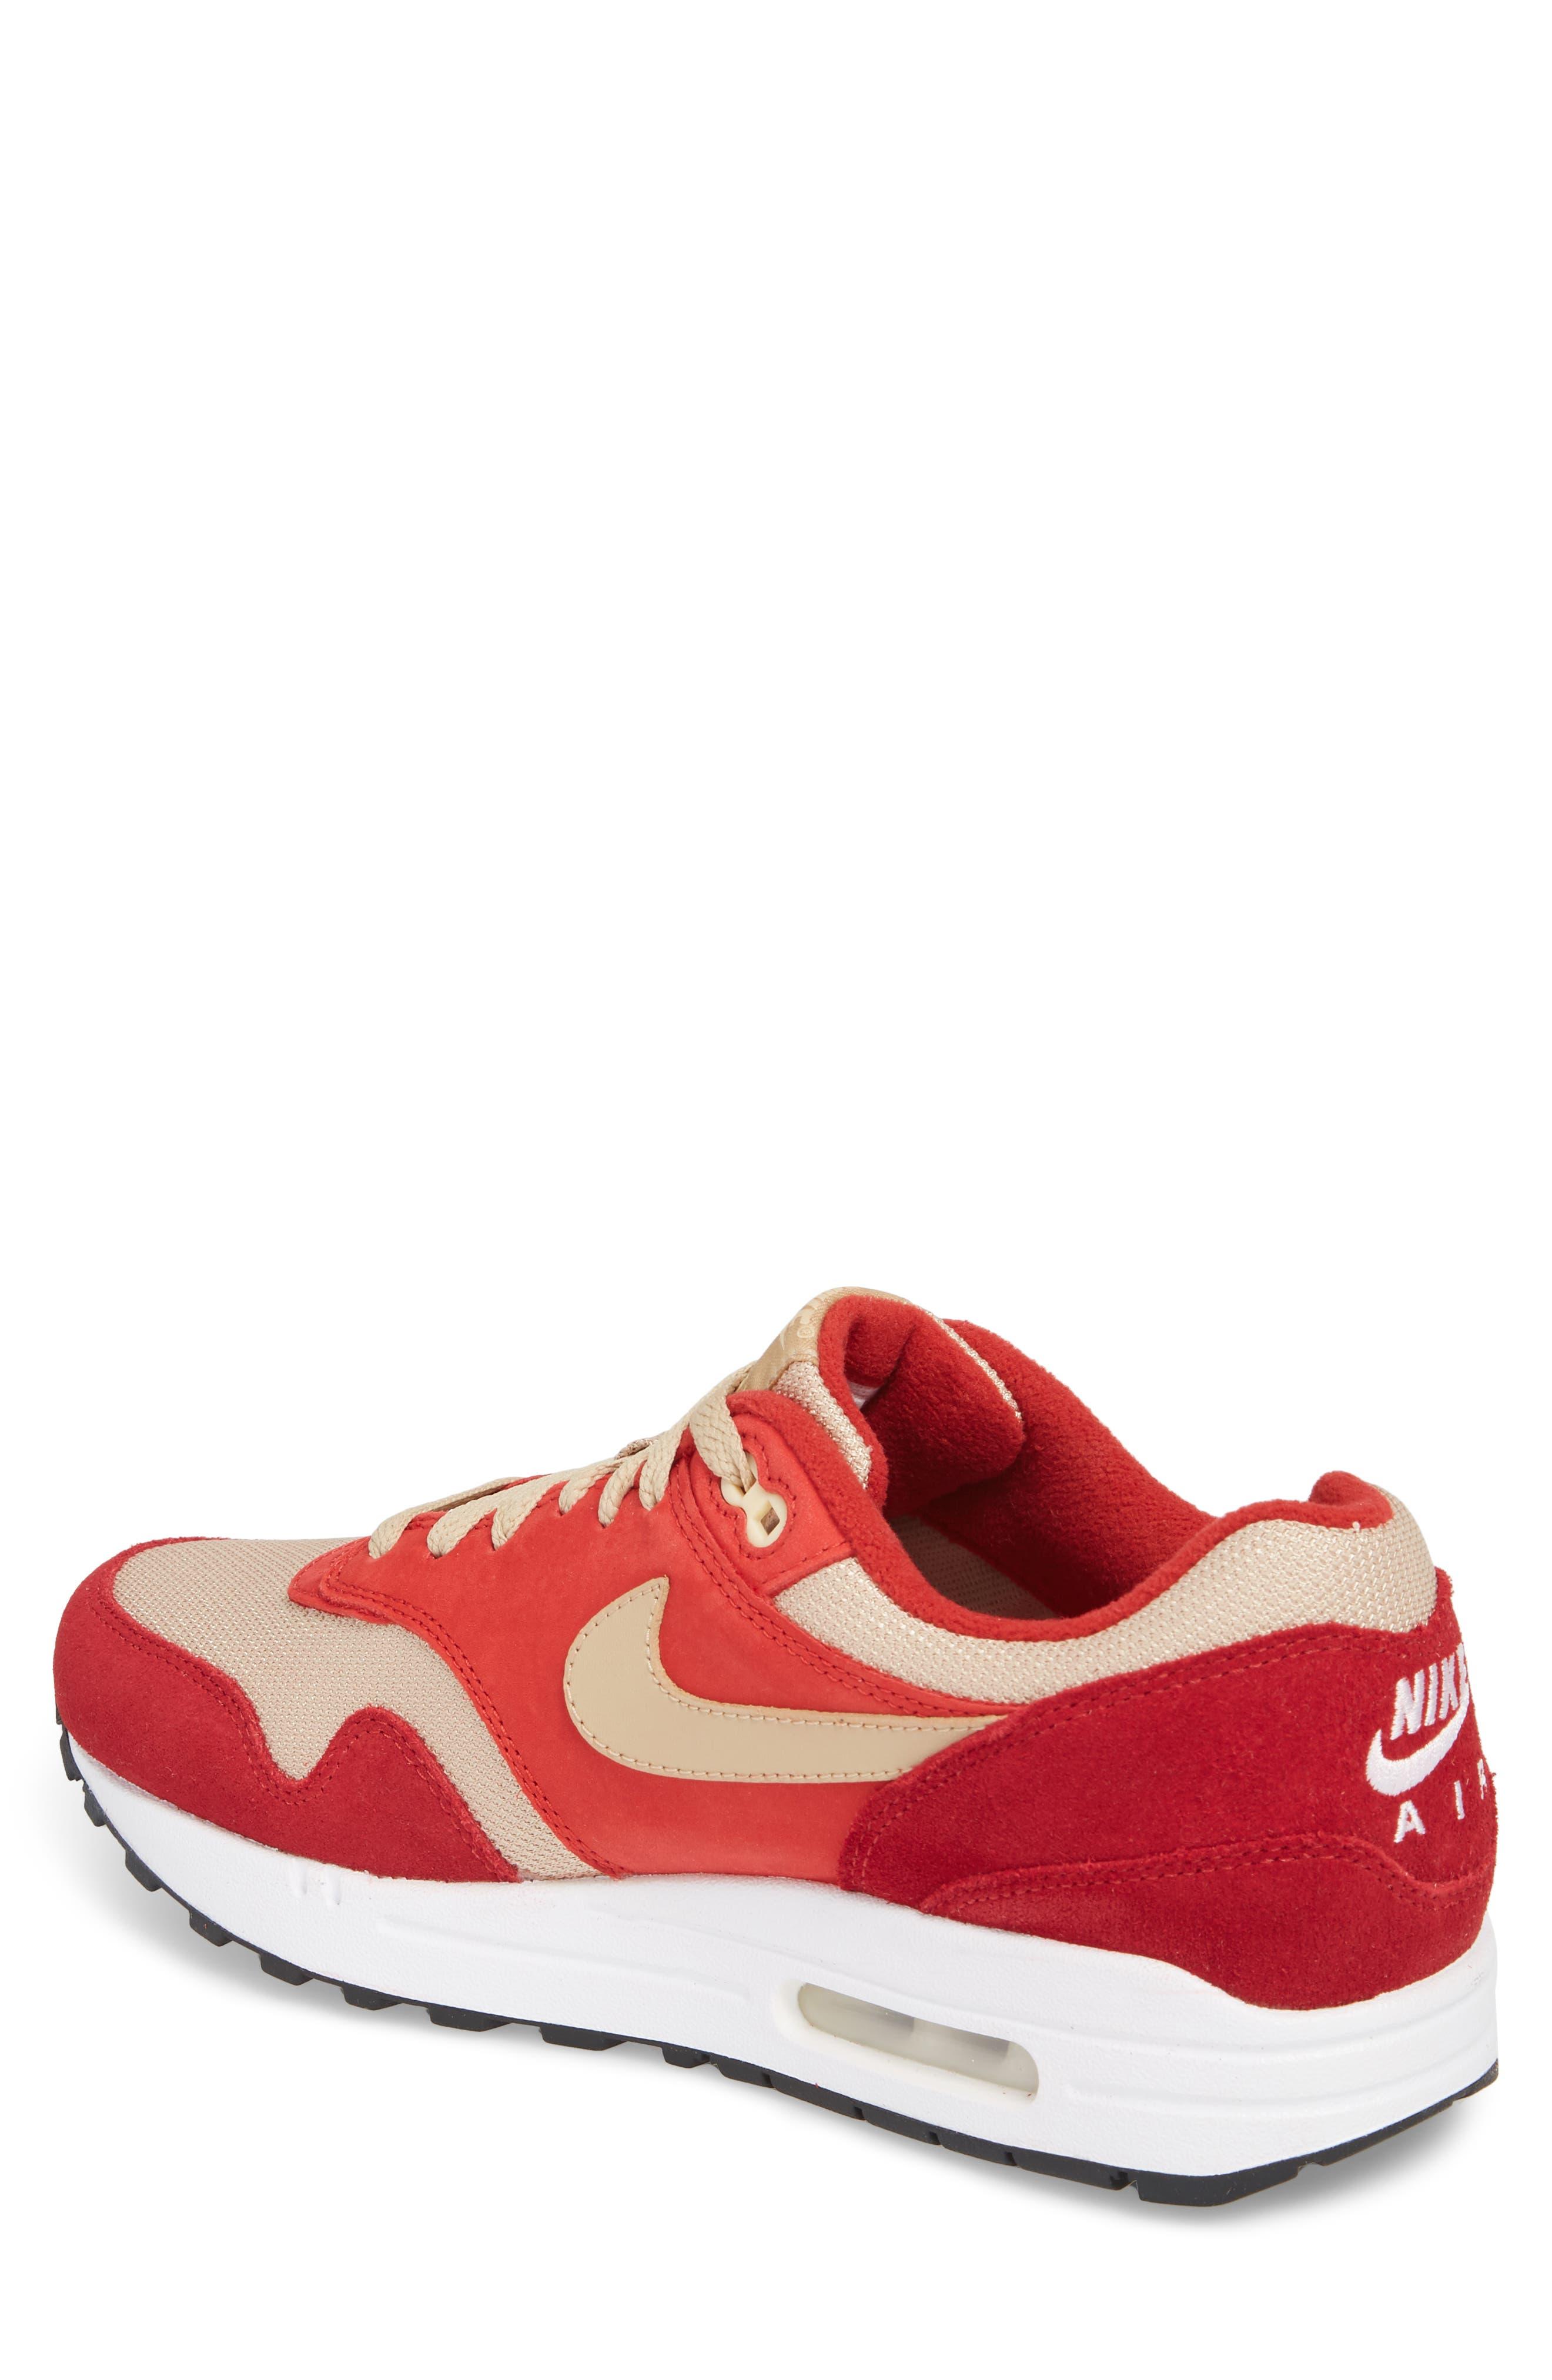 Air Max 1 Premium Retro Sneaker,                             Alternate thumbnail 4, color,